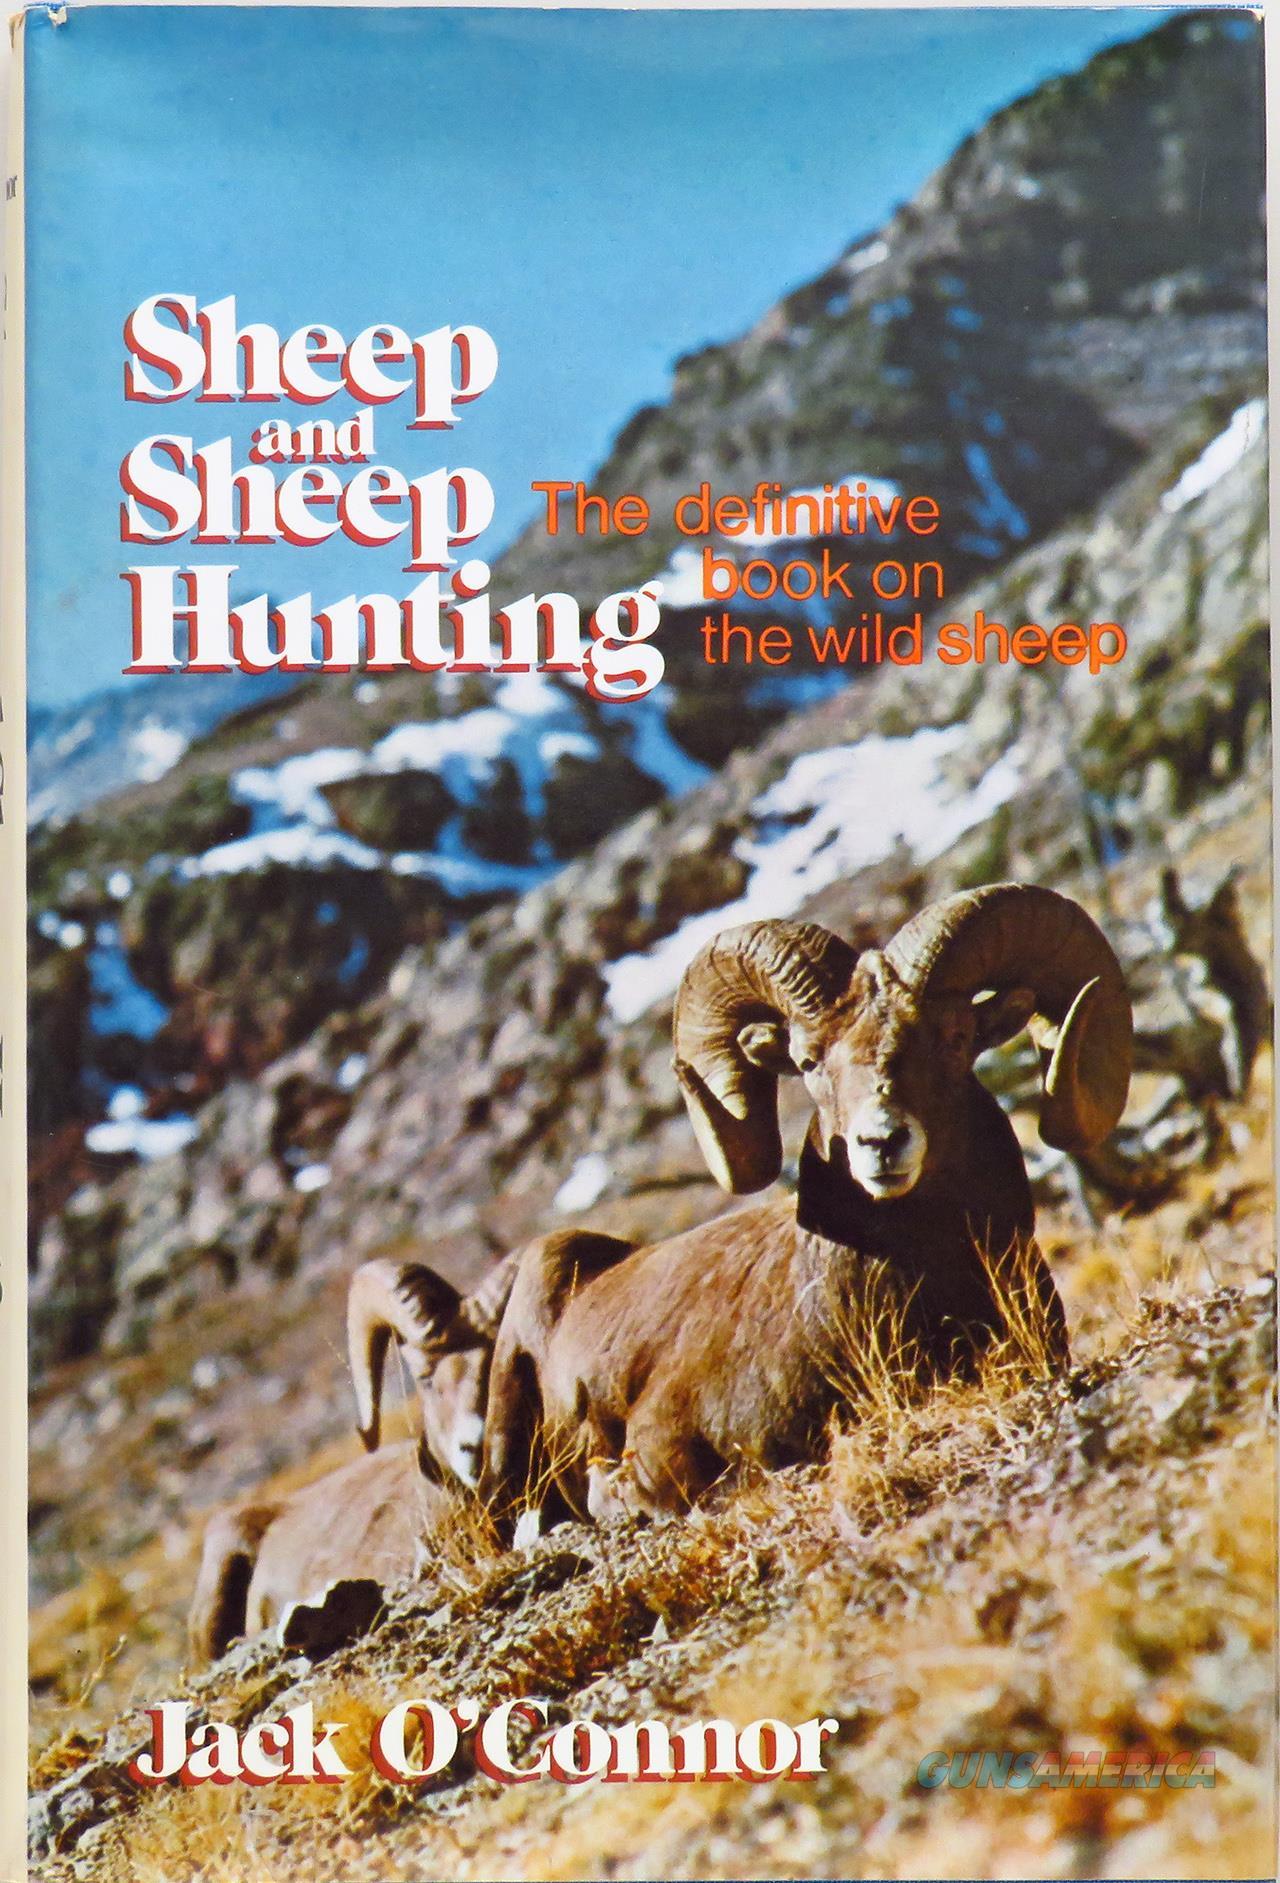 Jack O'Connor, Sheep and Sheep Hunting, Winchester Press, 1974  Non-Guns > Books & Magazines